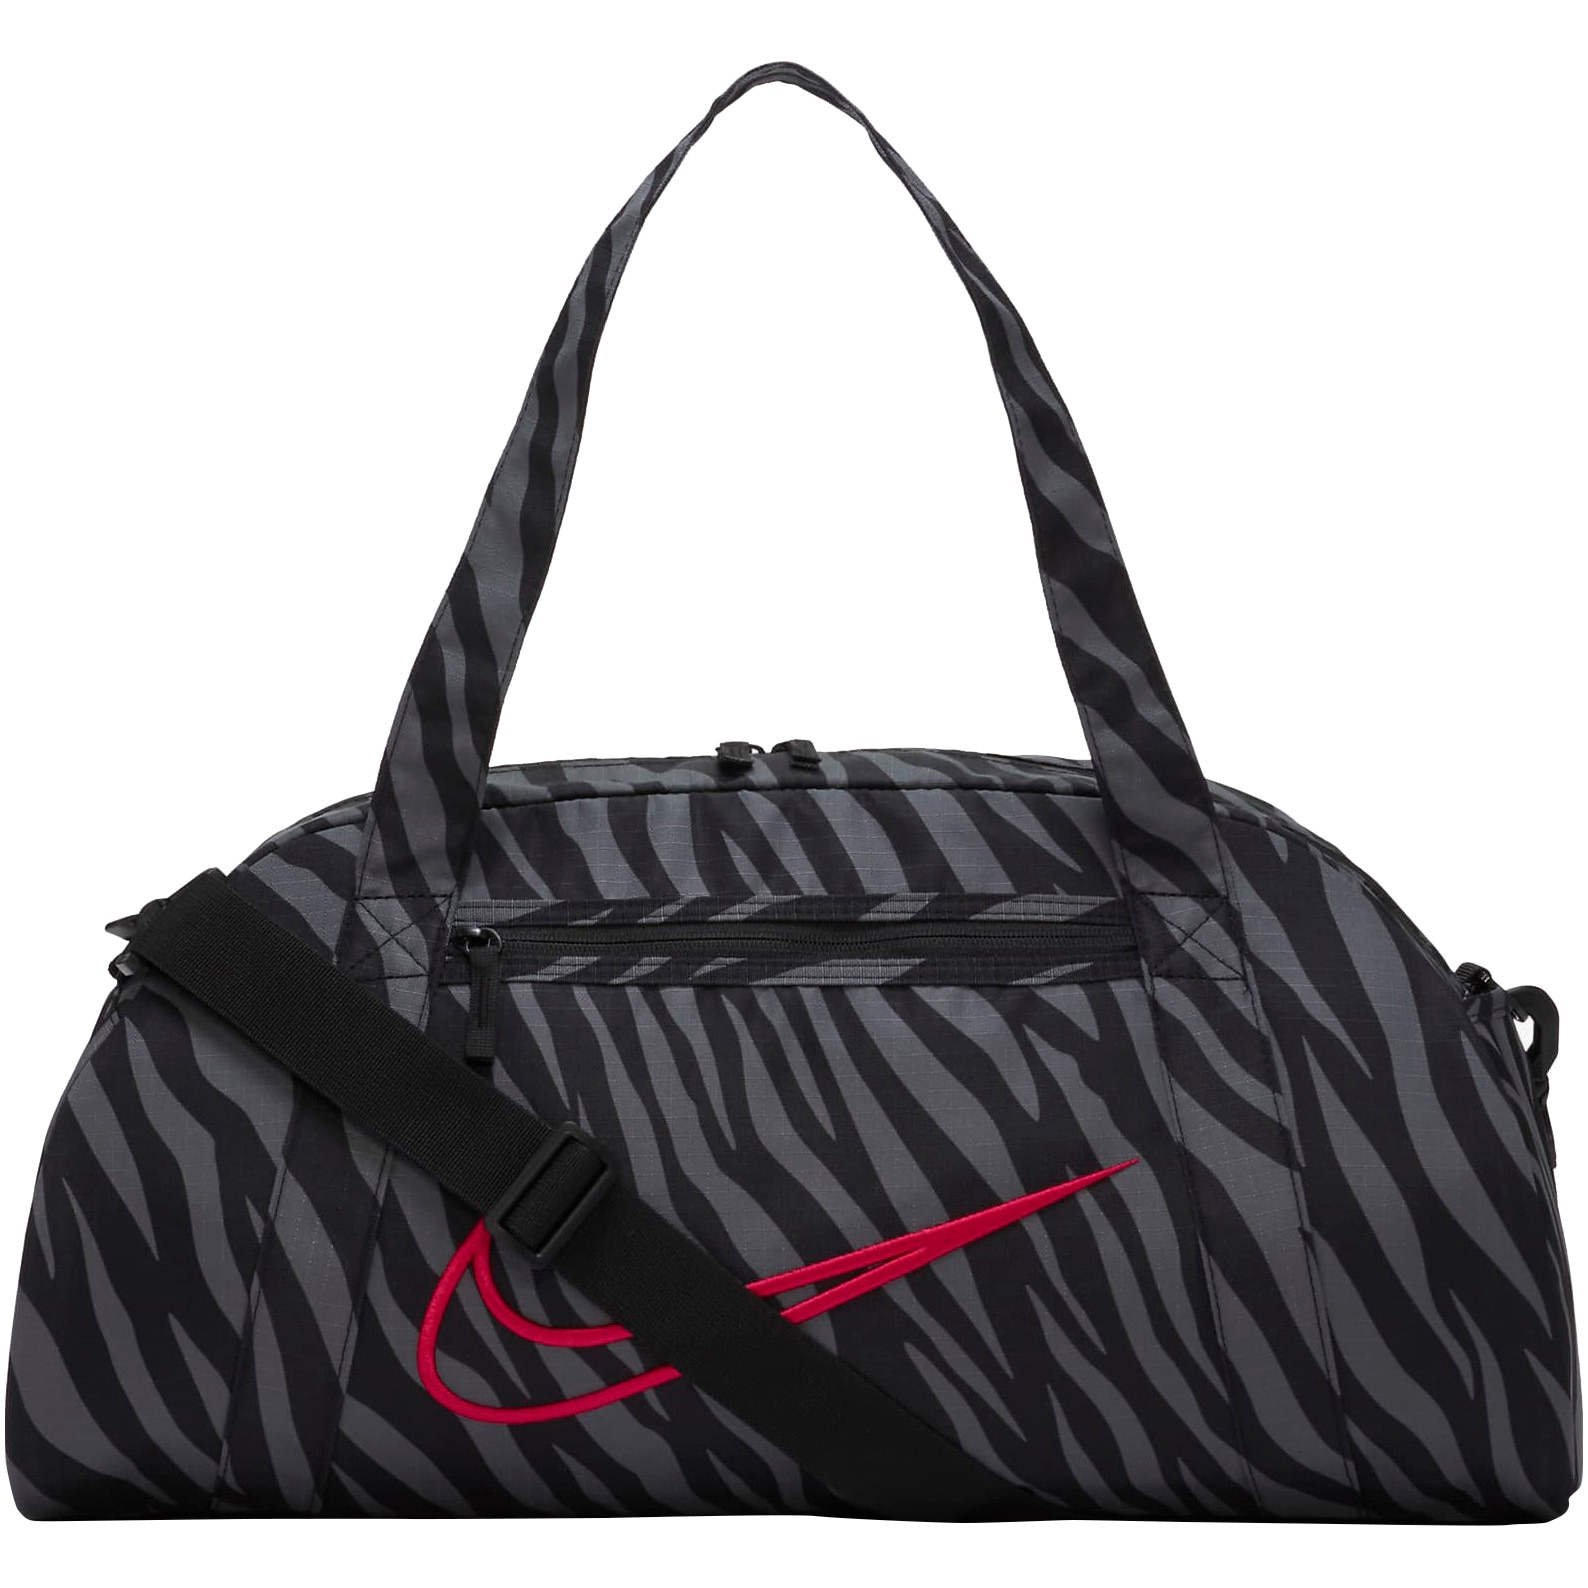 Fotografie Geanta sport Nike Gym Club, Black/Grey